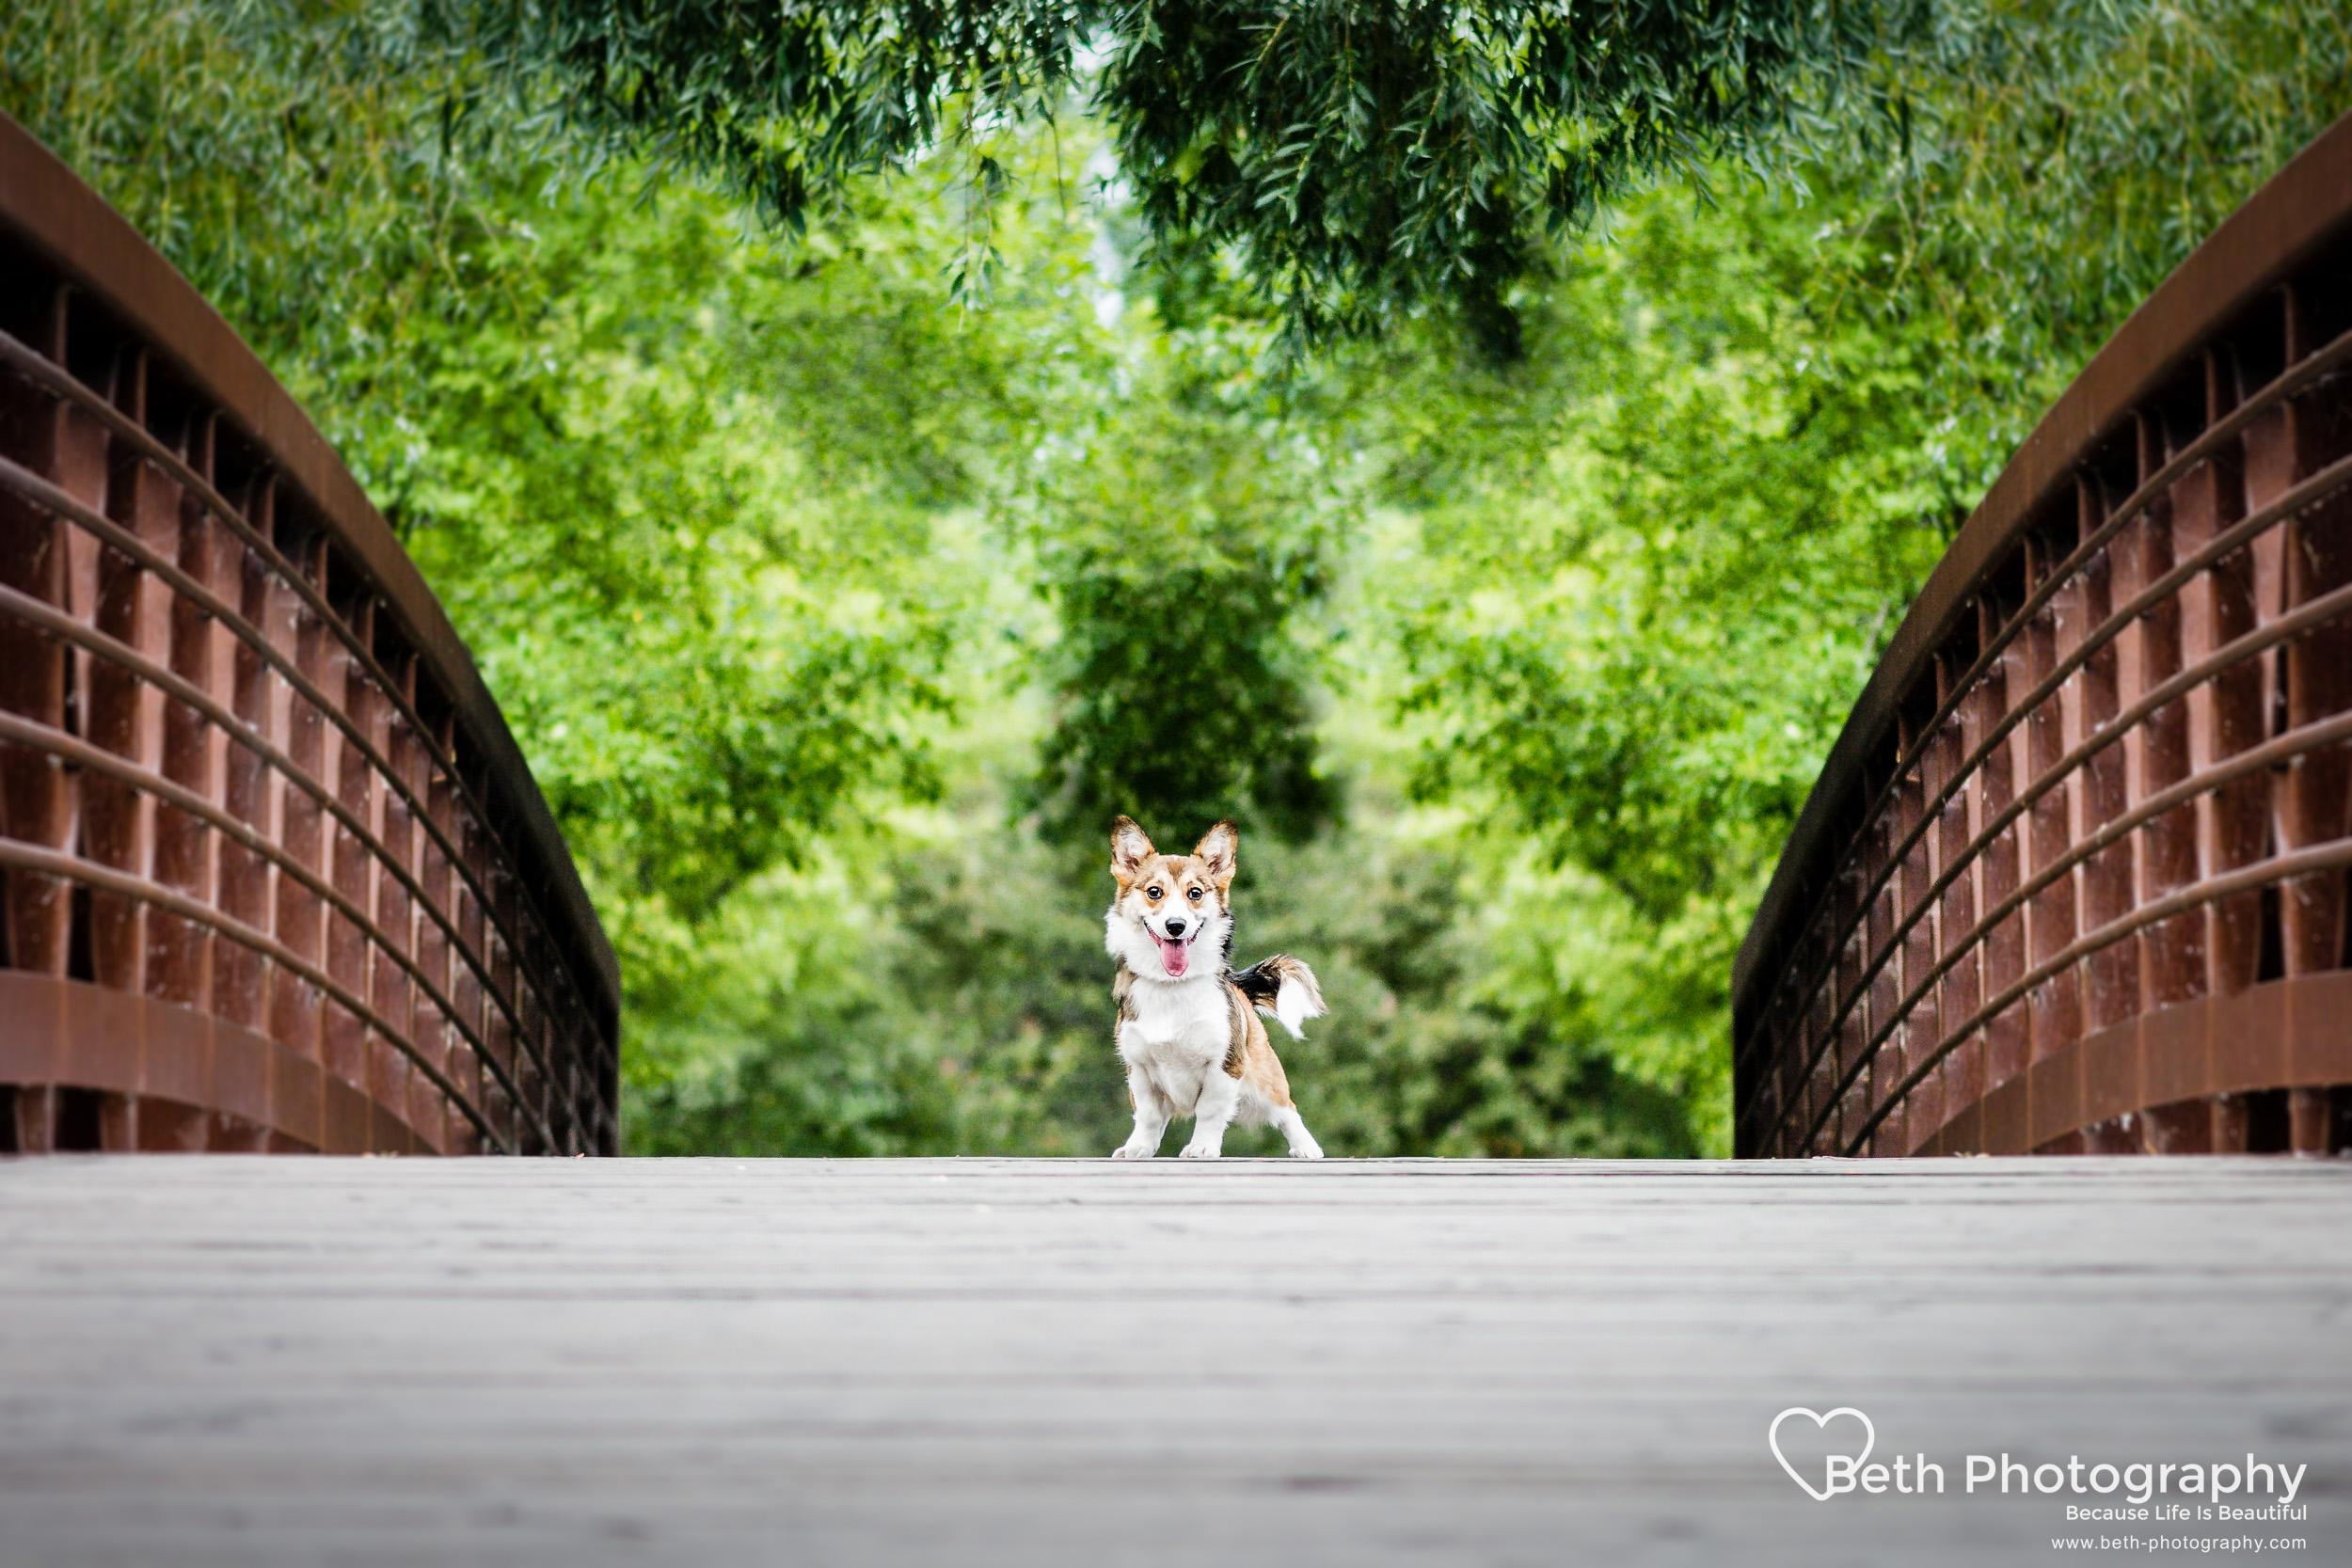 Beth Photography - Pet Photographer -Servicing Ottawa to Cornwall-34.jpg